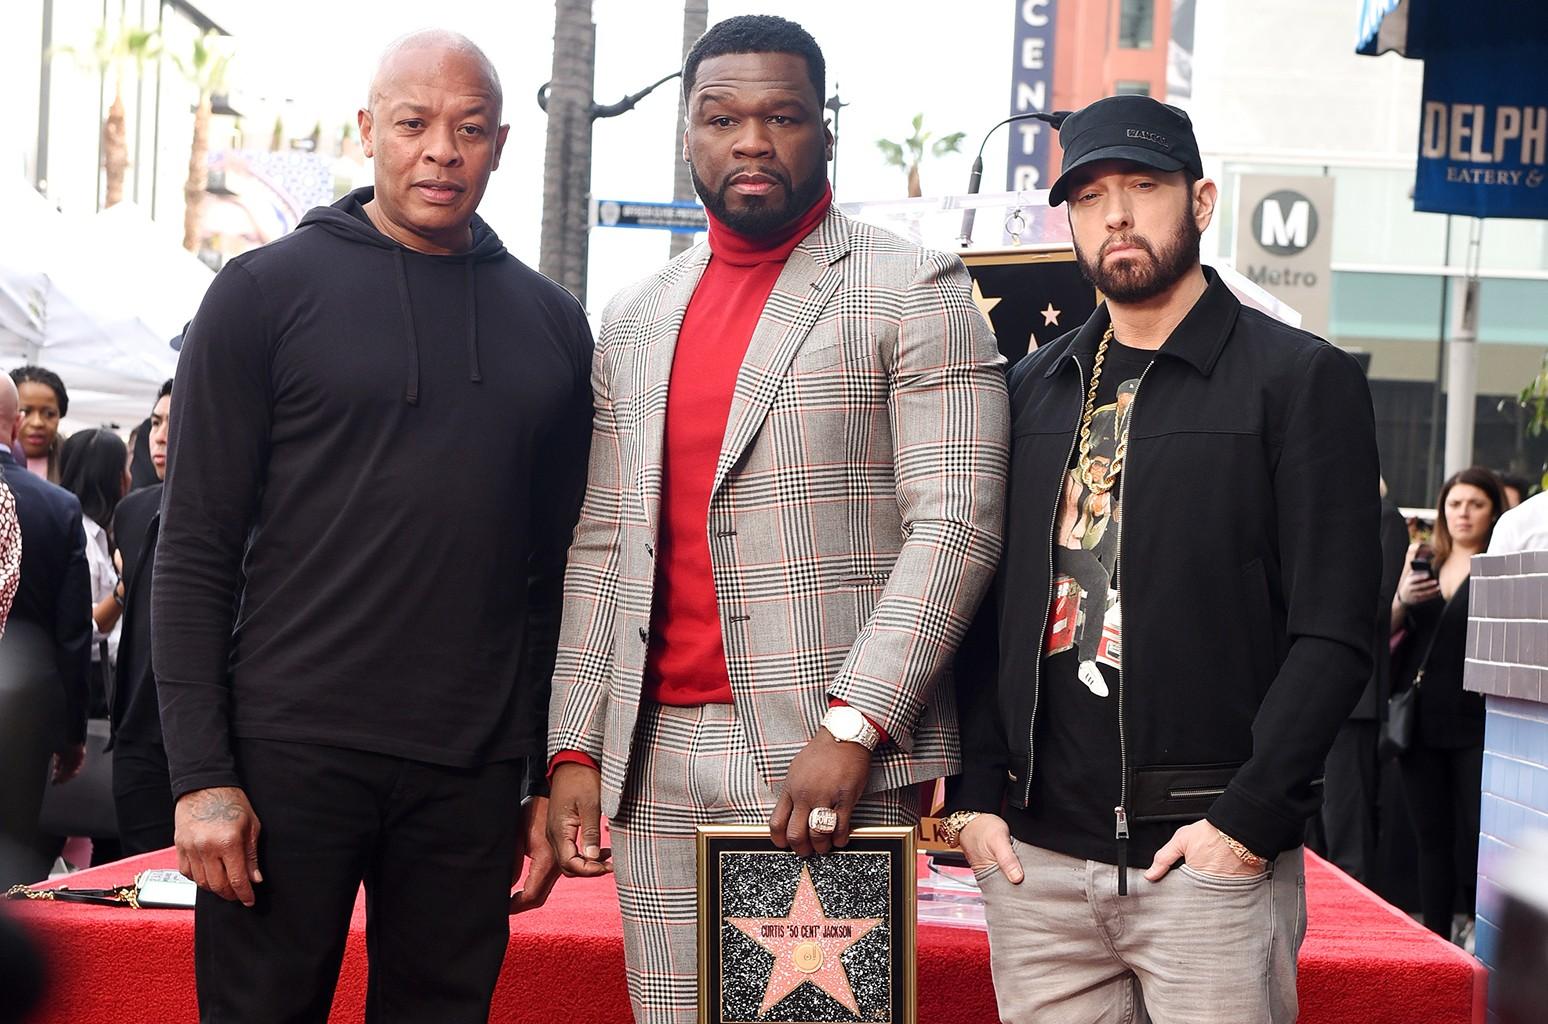 Dr. Dre, 50 Cent, and Eminem